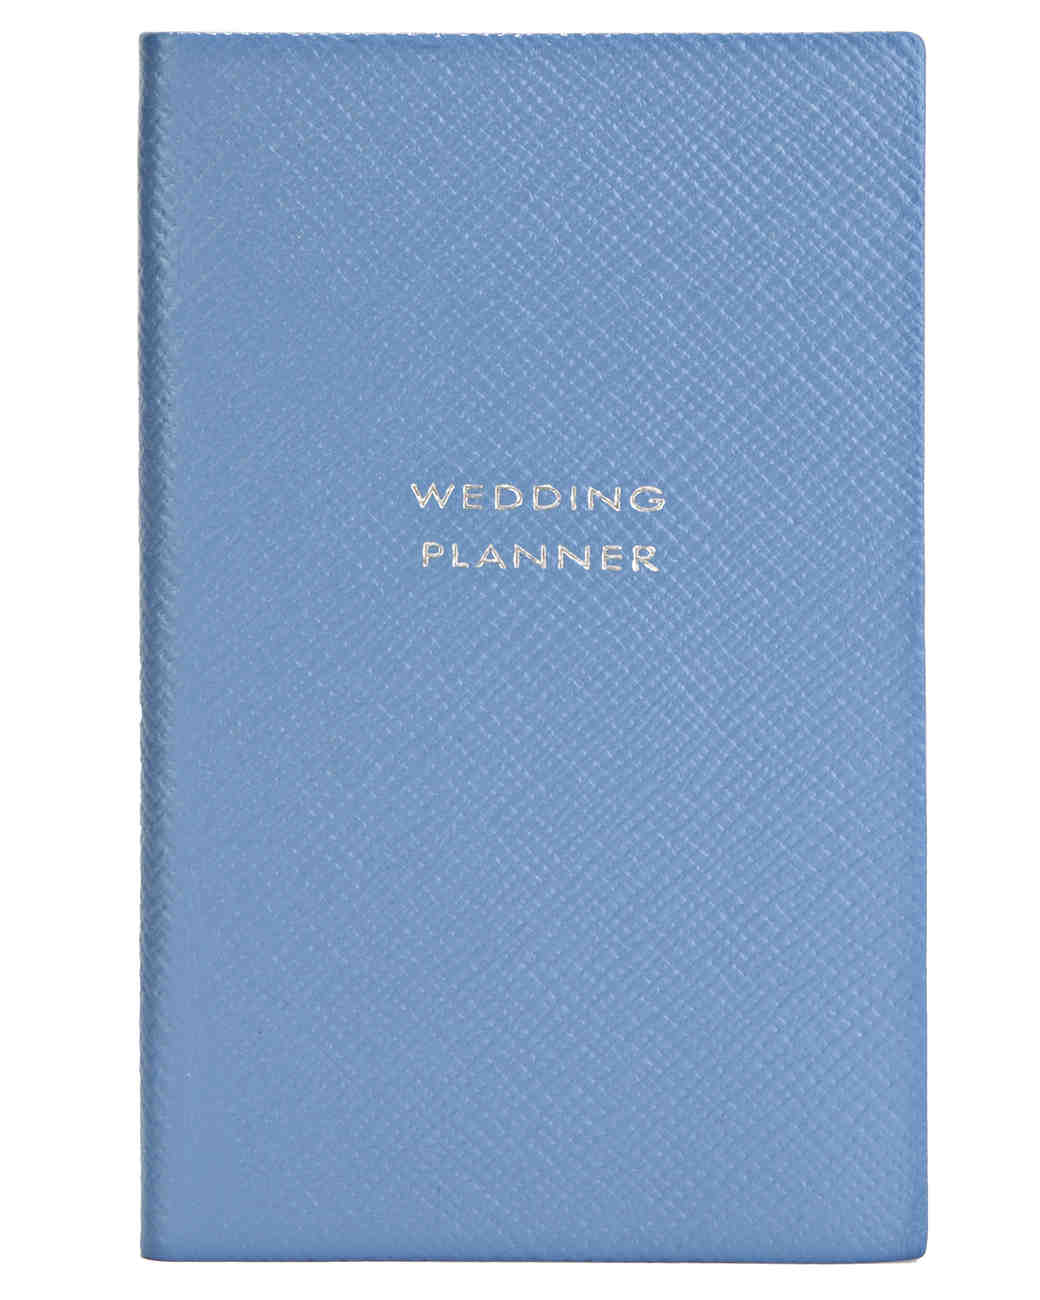 weddings-planners-smythson.jpg